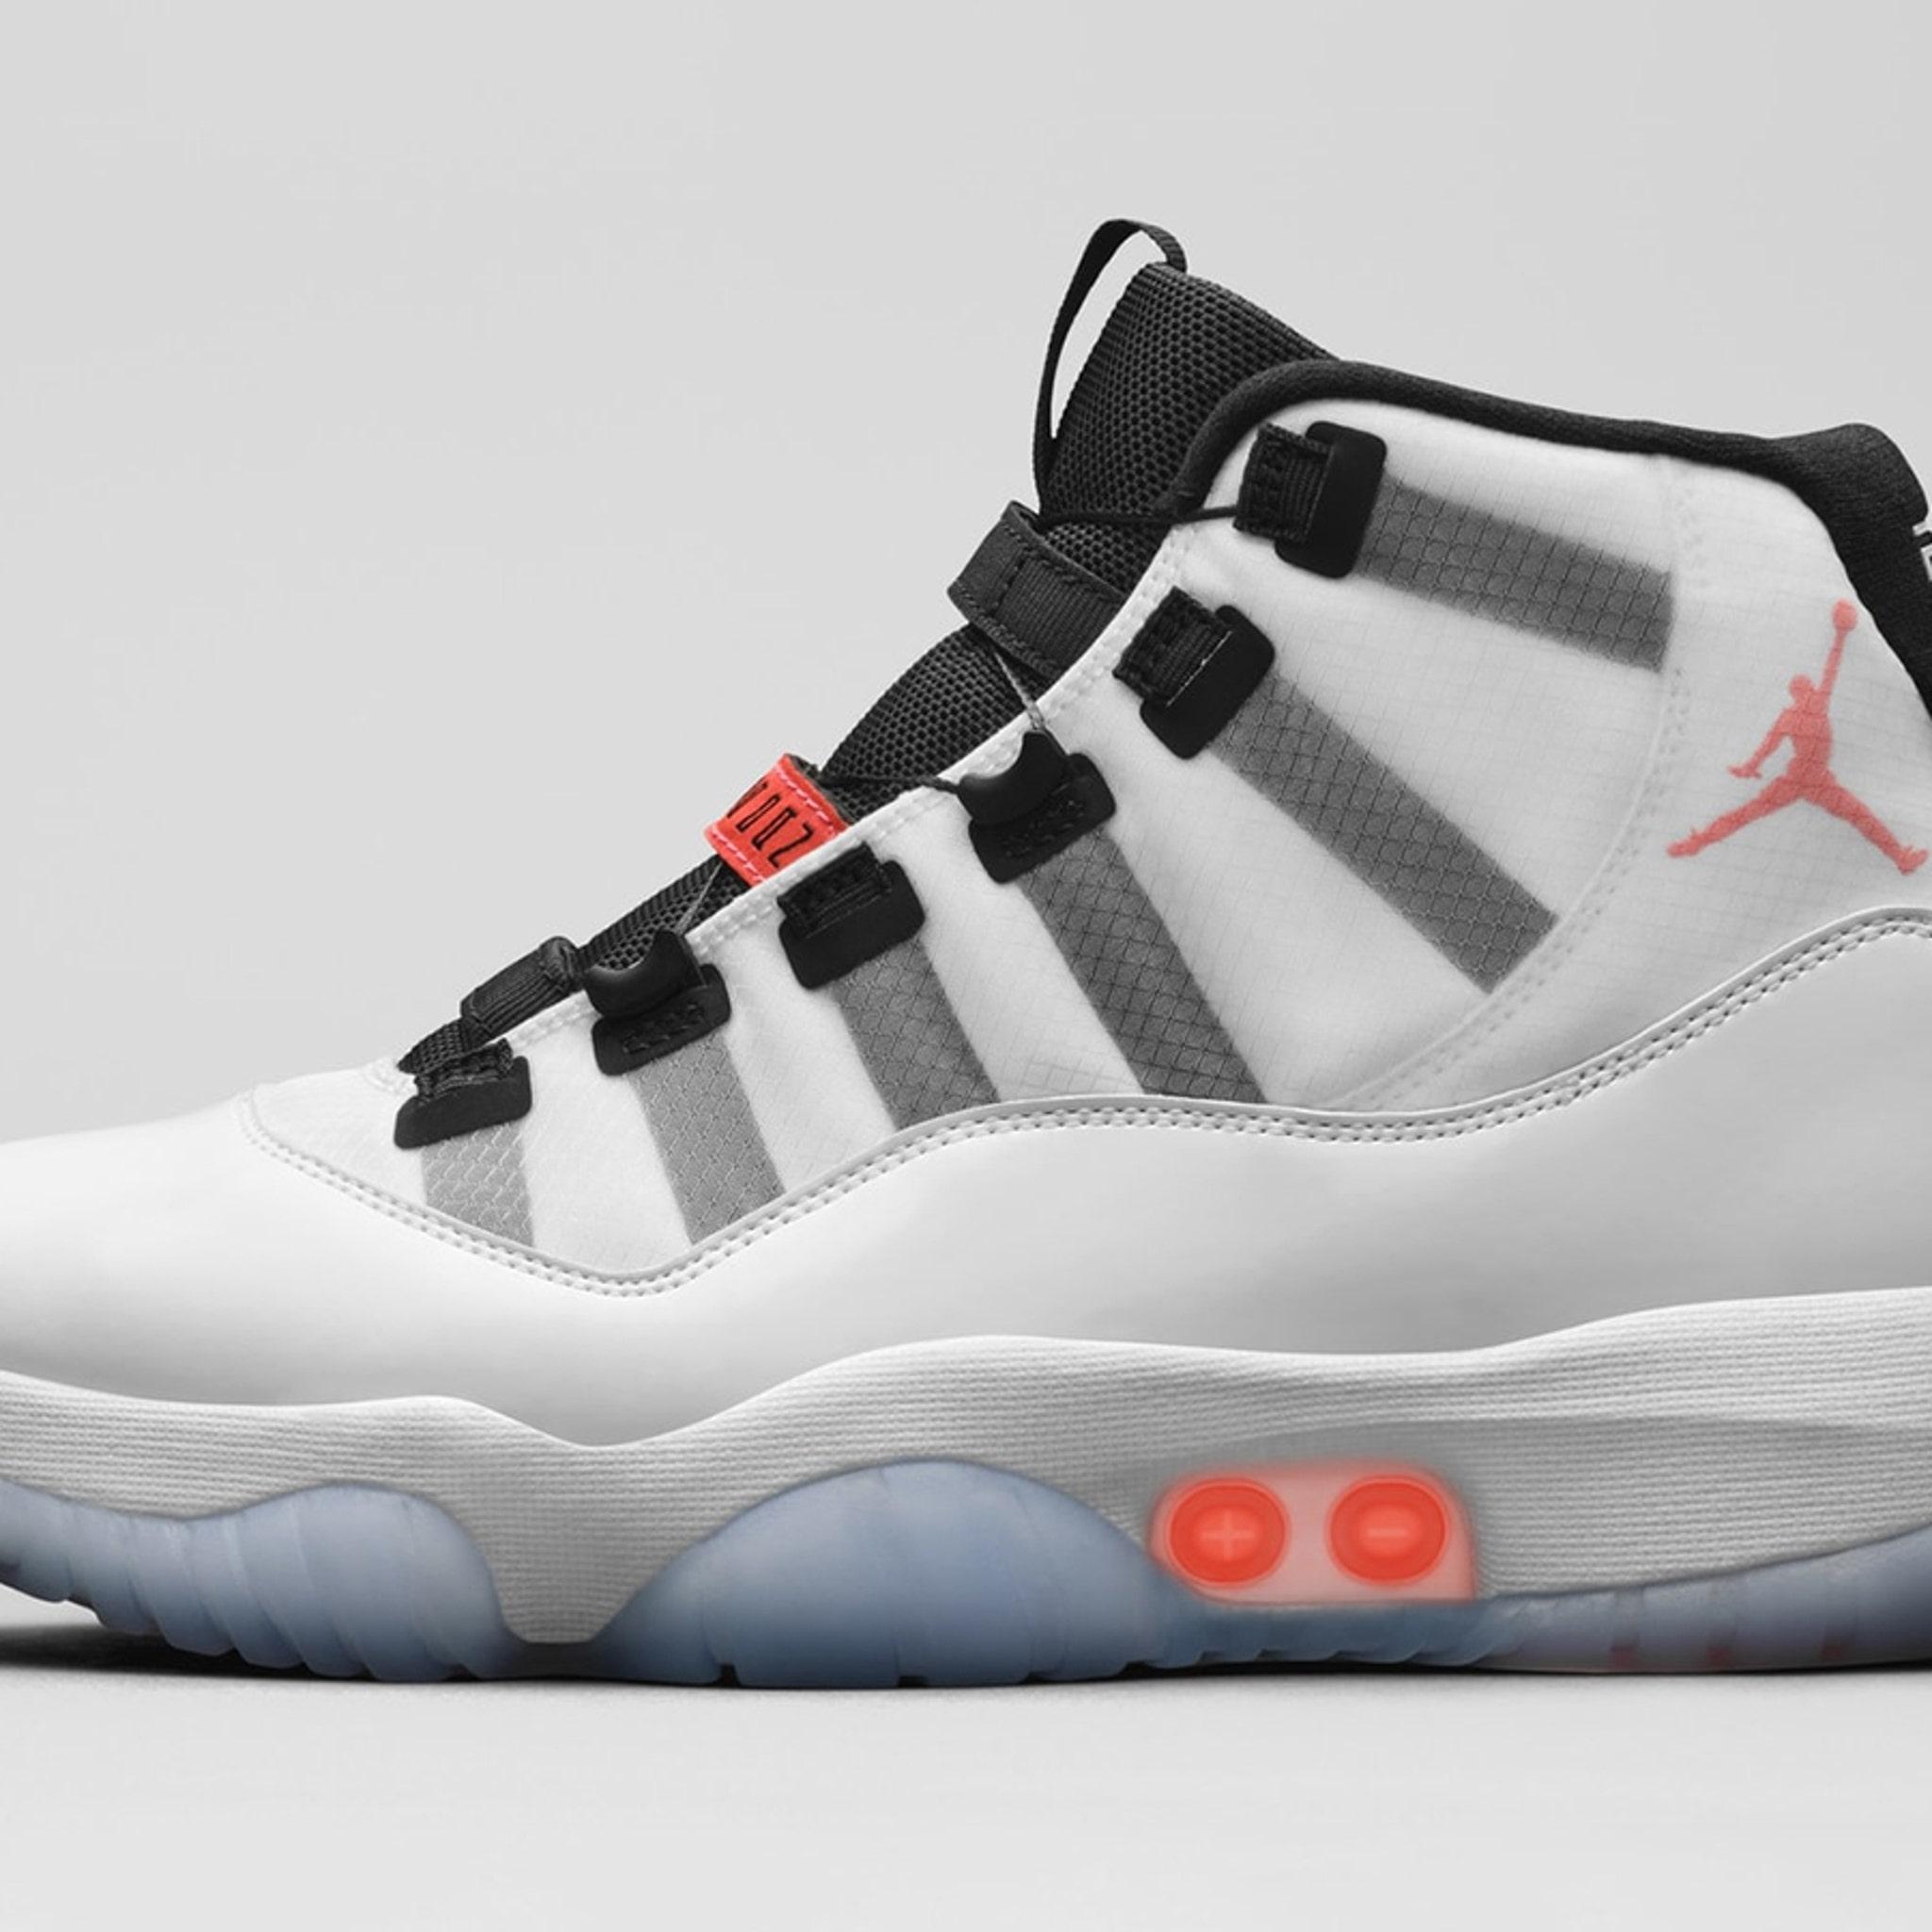 Jordan Brand Reveals Auto-Lacing Air Jordan 11s, No Strings? No ...